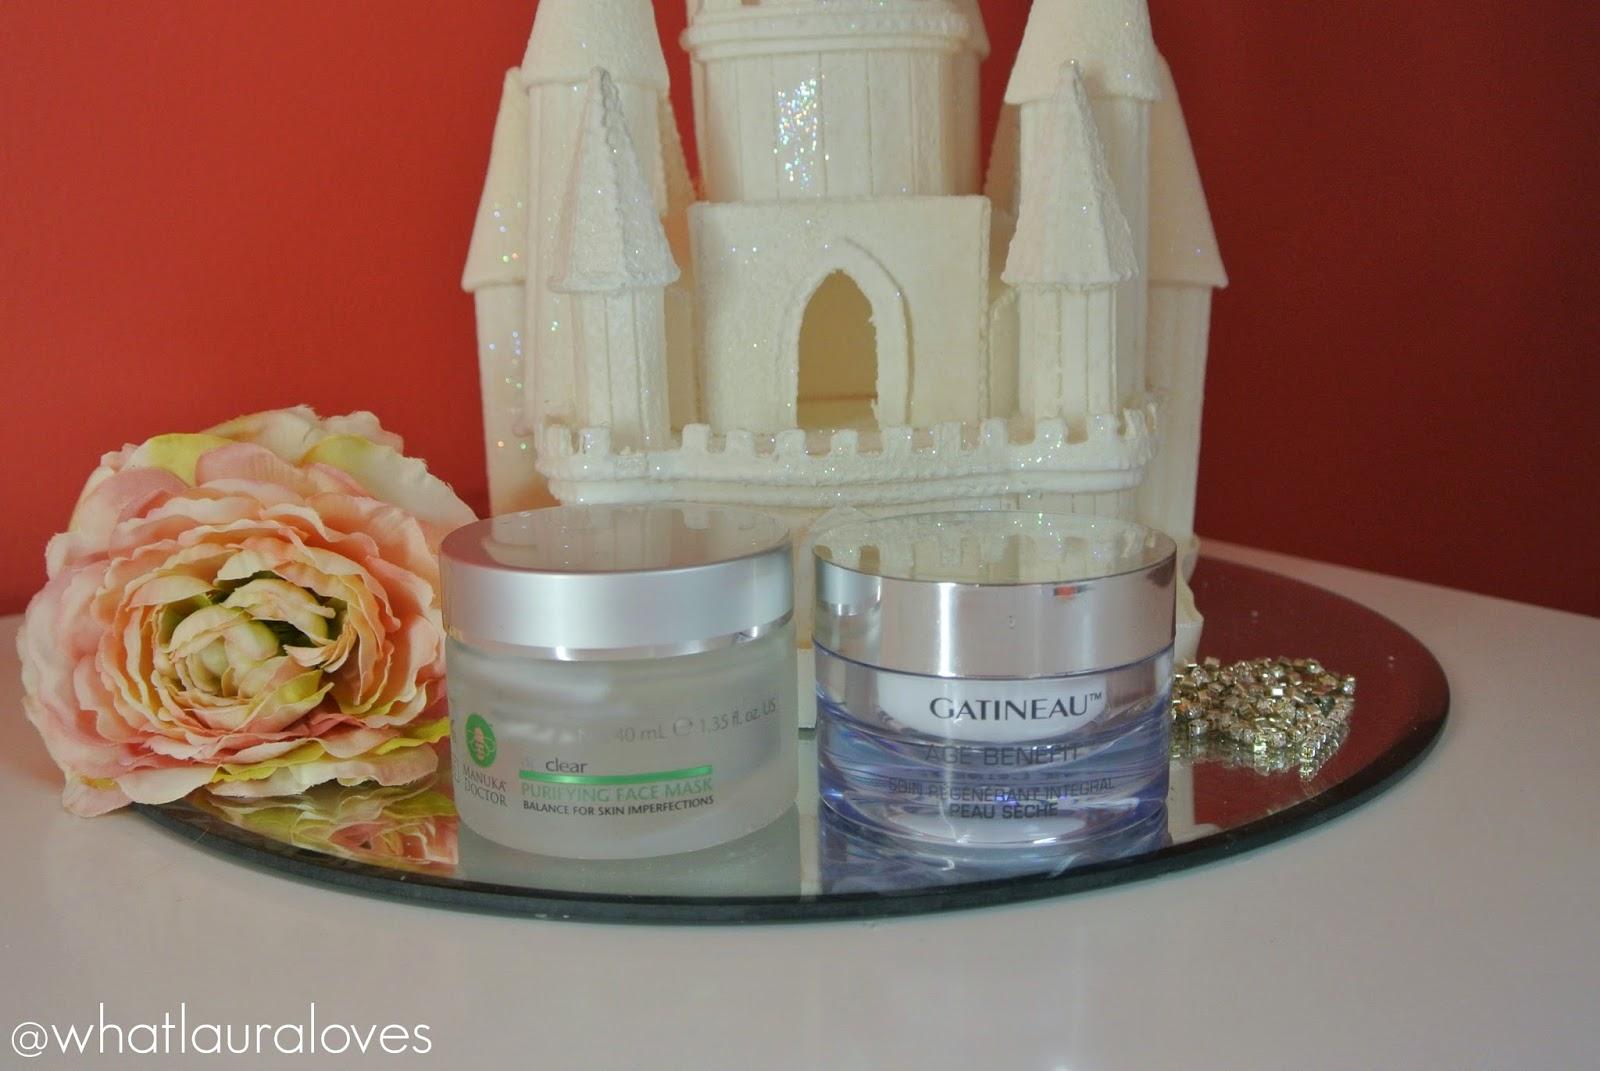 Manuka Doctor ApiClear Mask Gatineau Age Benefit Cream